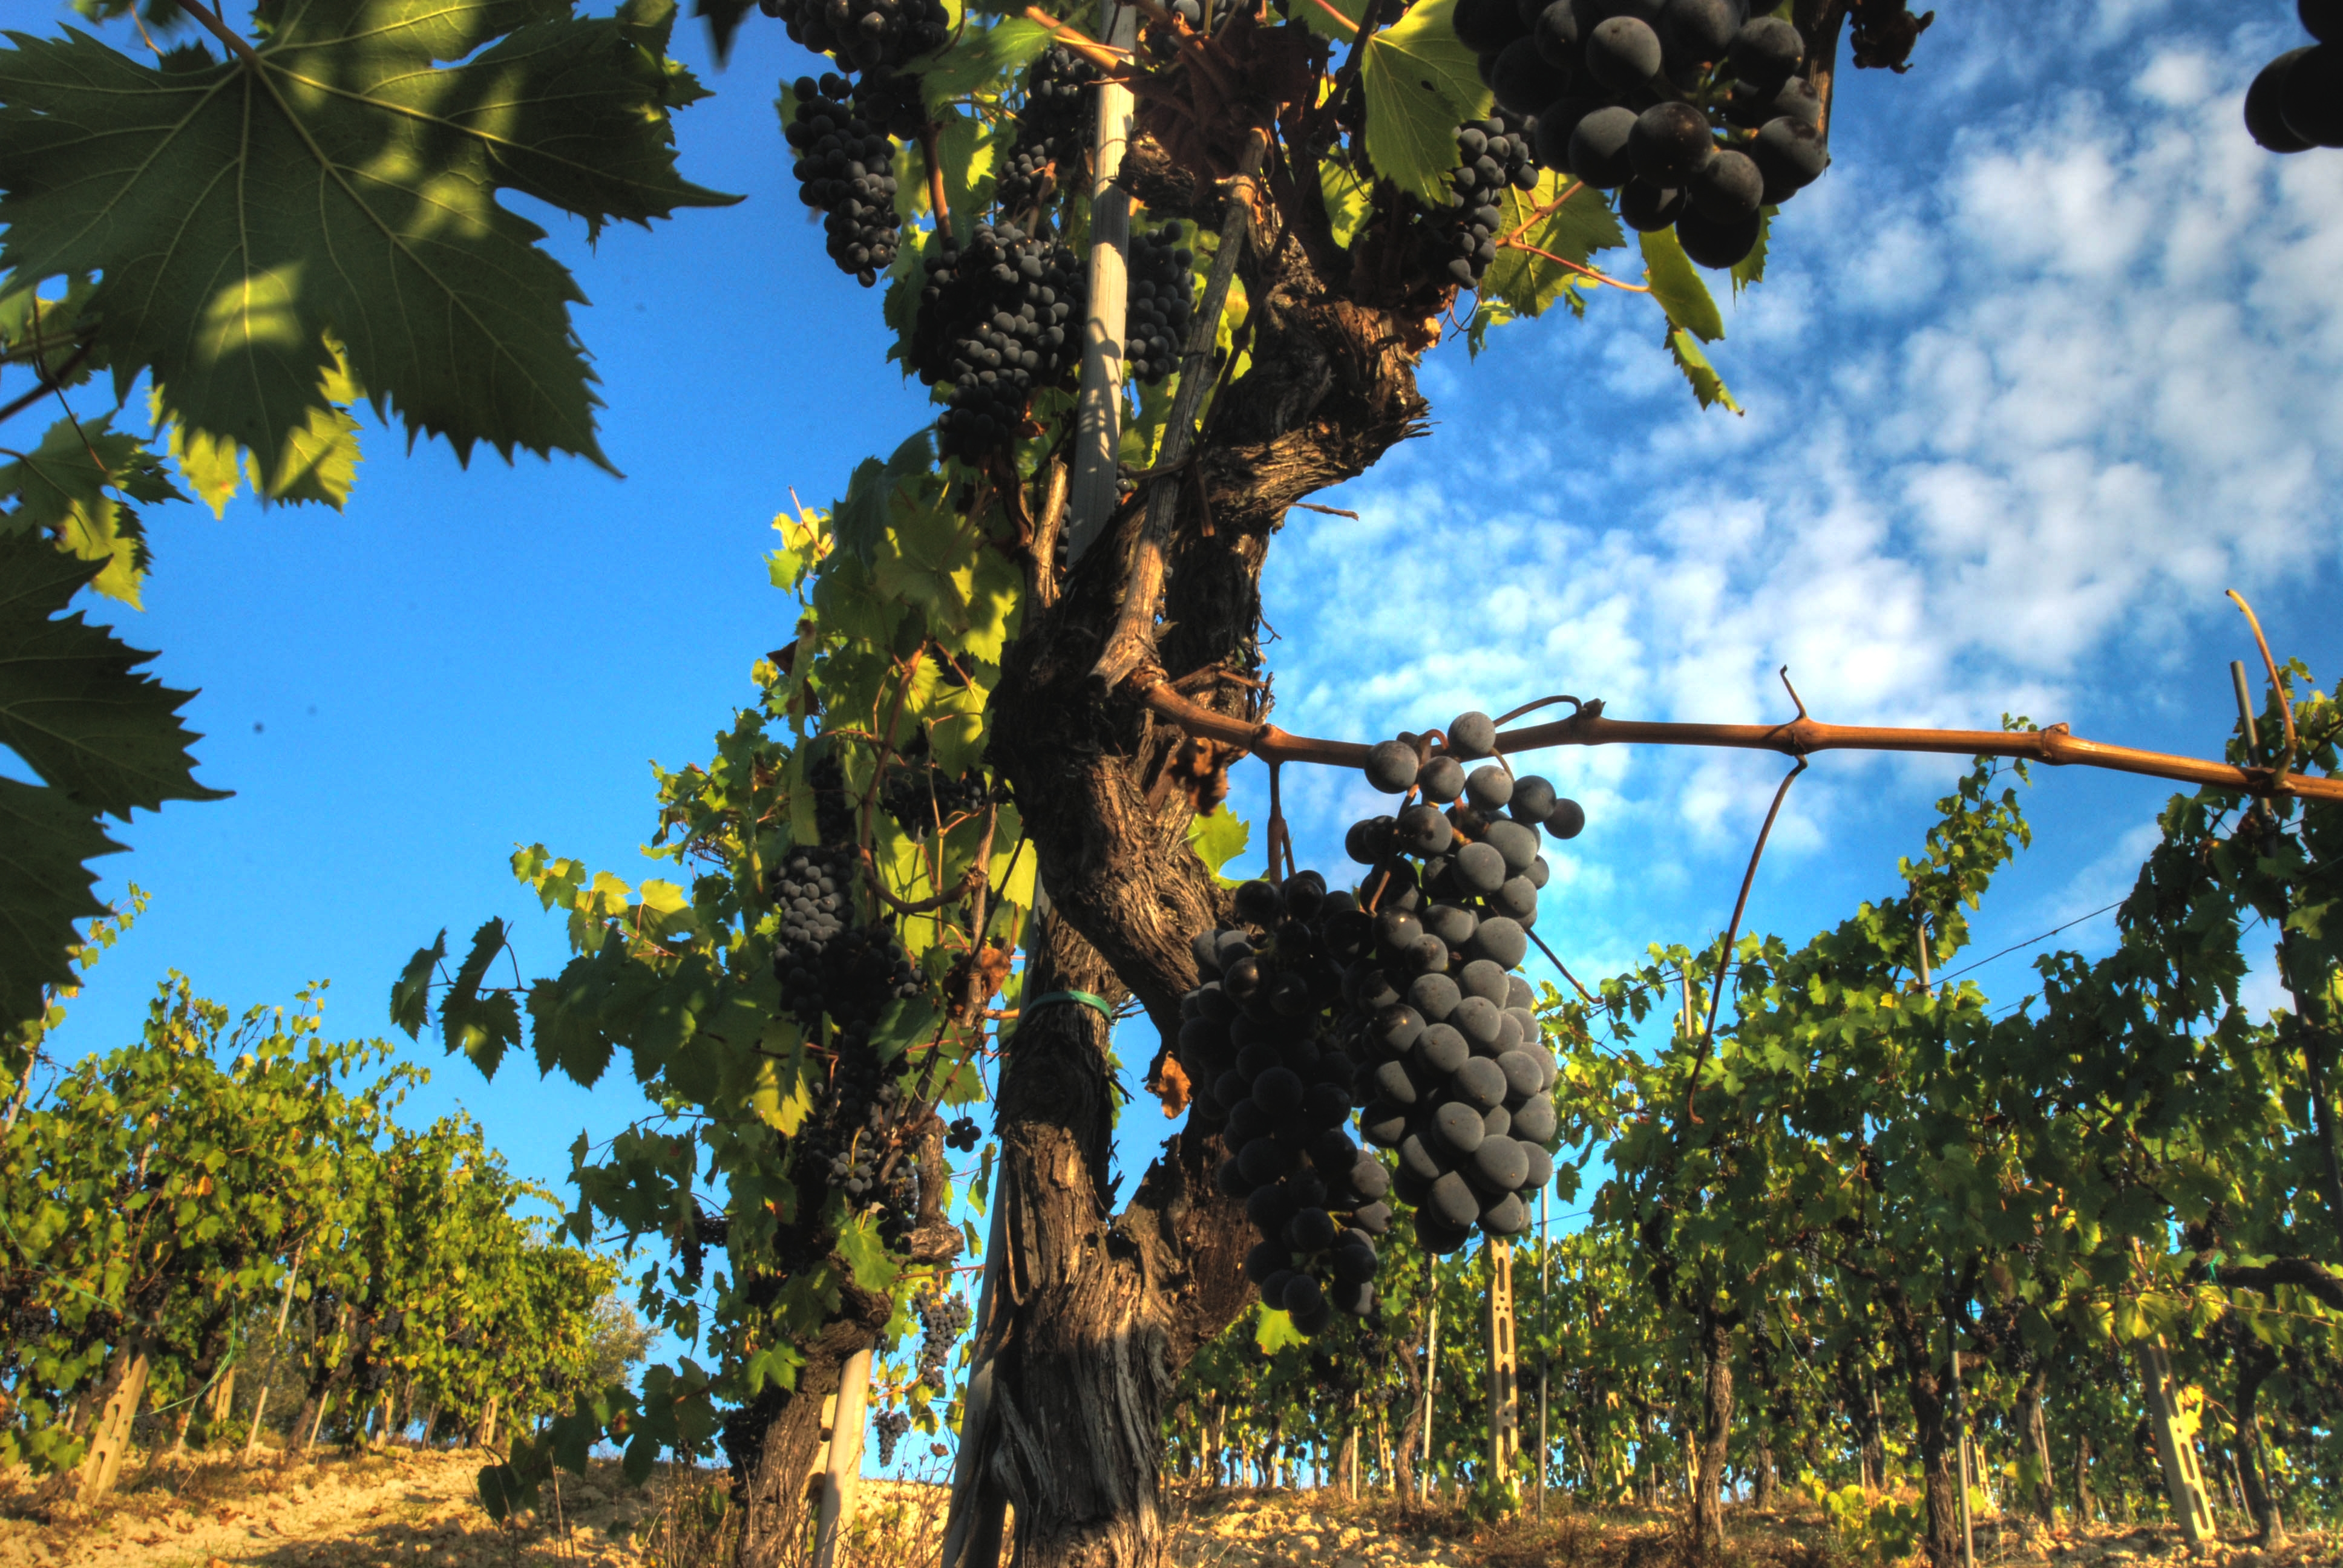 Zone 7 to 10 3 Cuttings Champagne Grape Seedless Grape Vine Cuttings